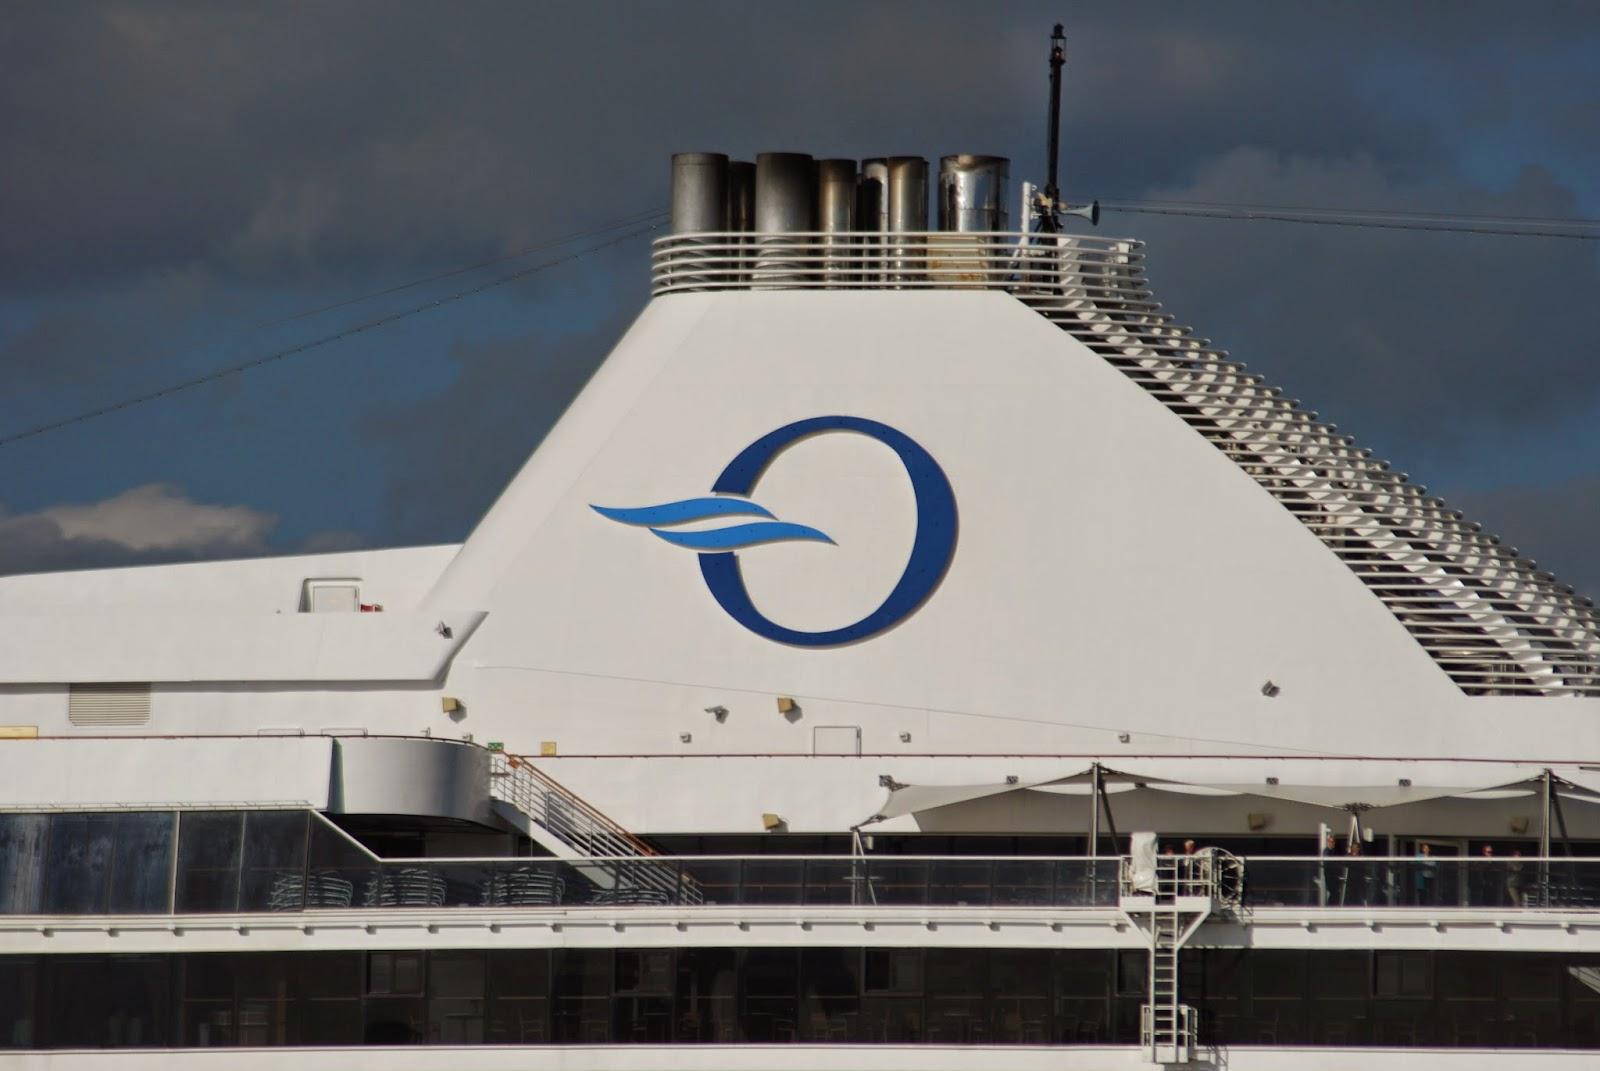 NAVIGATIONCruising And Maritime Themes MARINA Departing